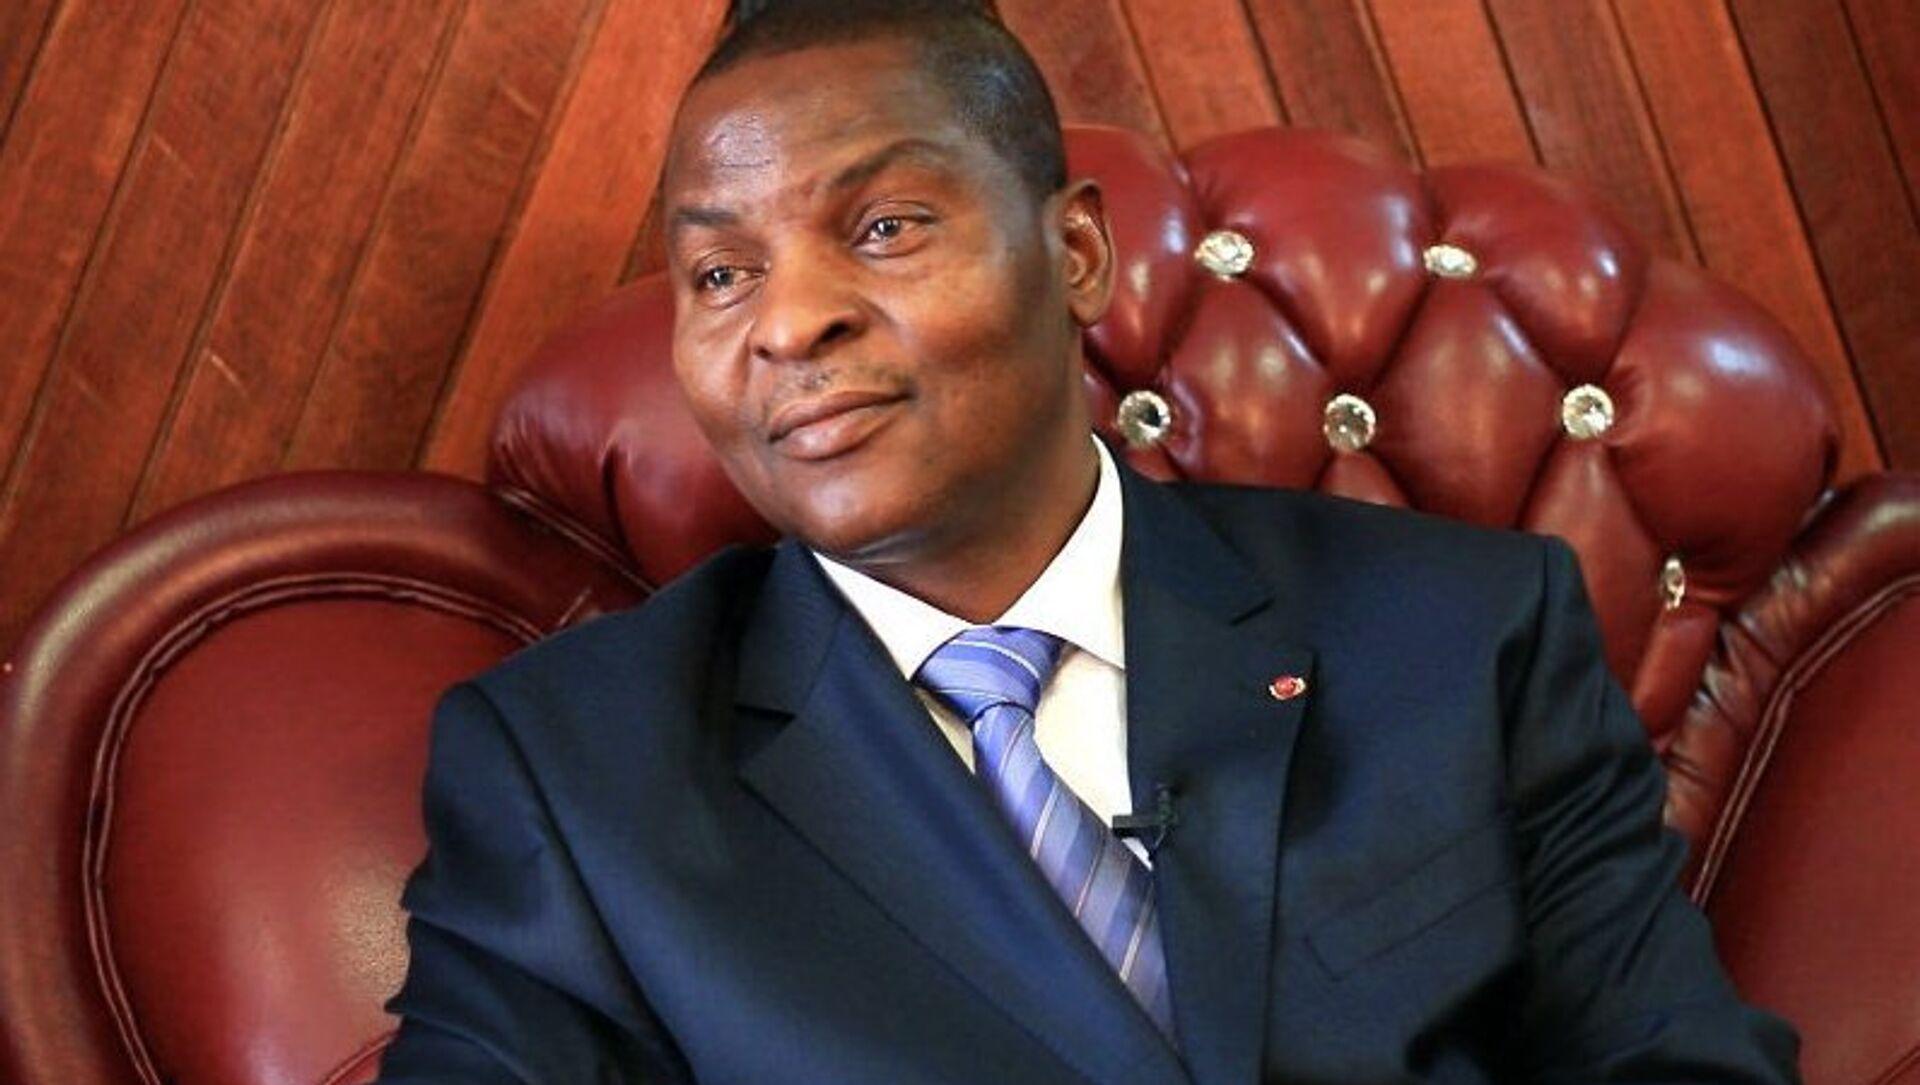 Faustin-Archange Touadéra, président centrafricain - Sputnik France, 1920, 05.08.2021